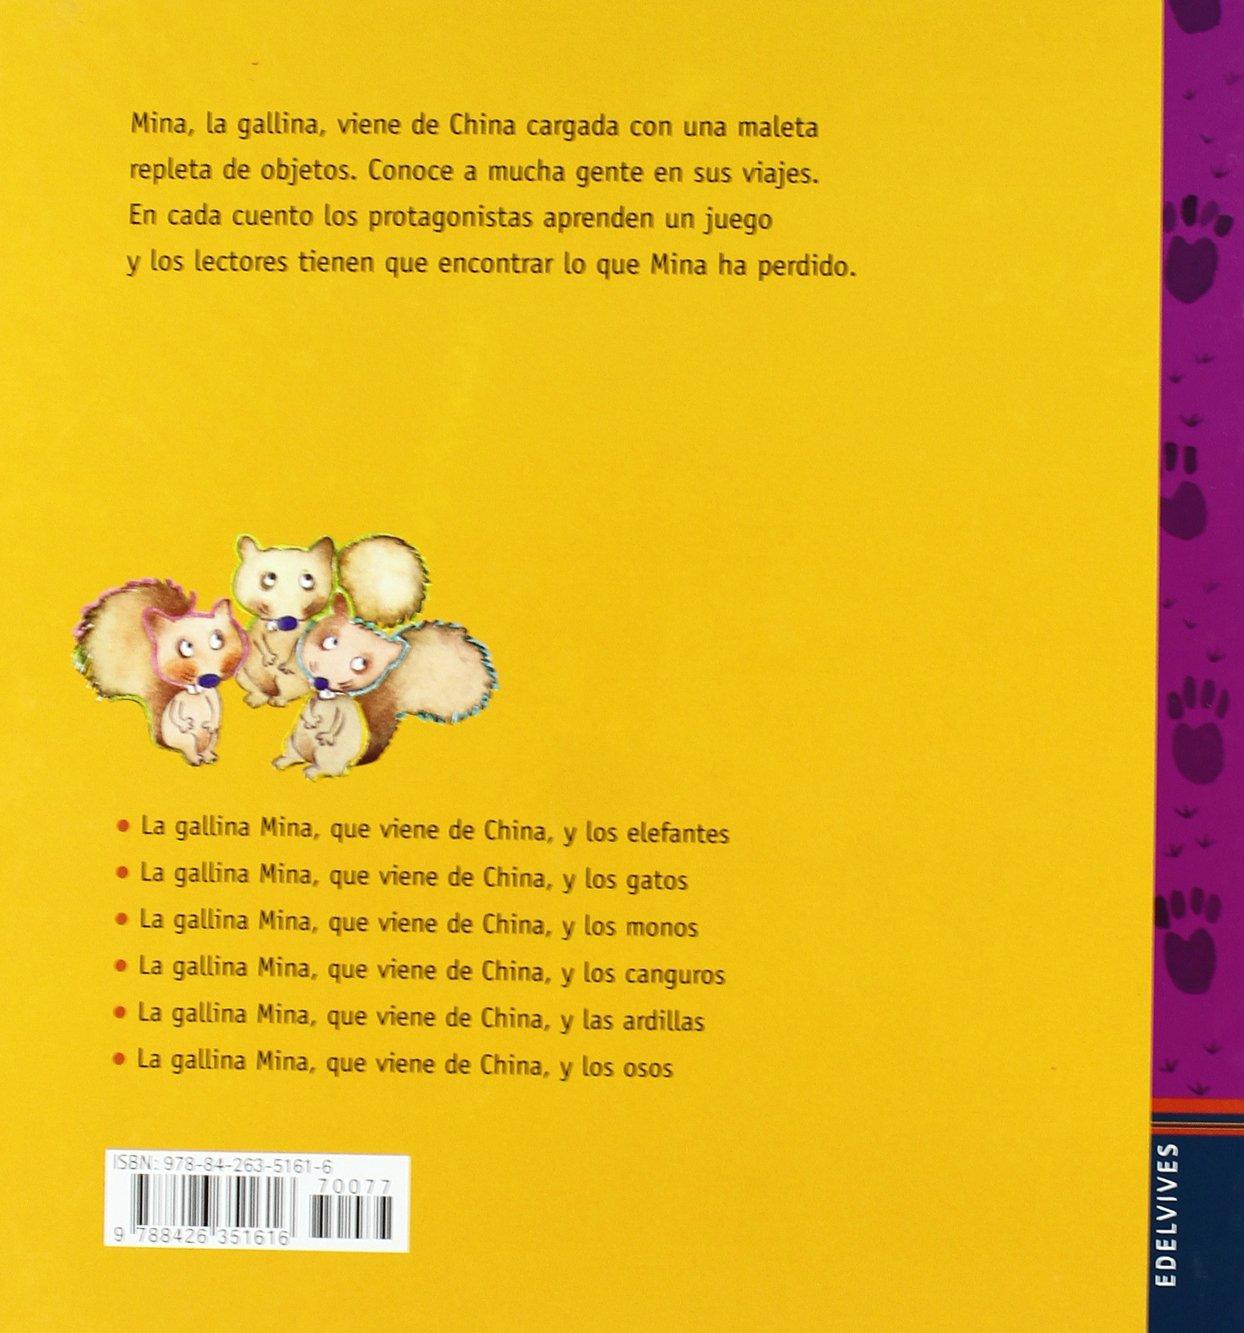 La gallina Mina que viene de China y las ardillas: Mercè Arànega: 9788426351616: Amazon.com: Books